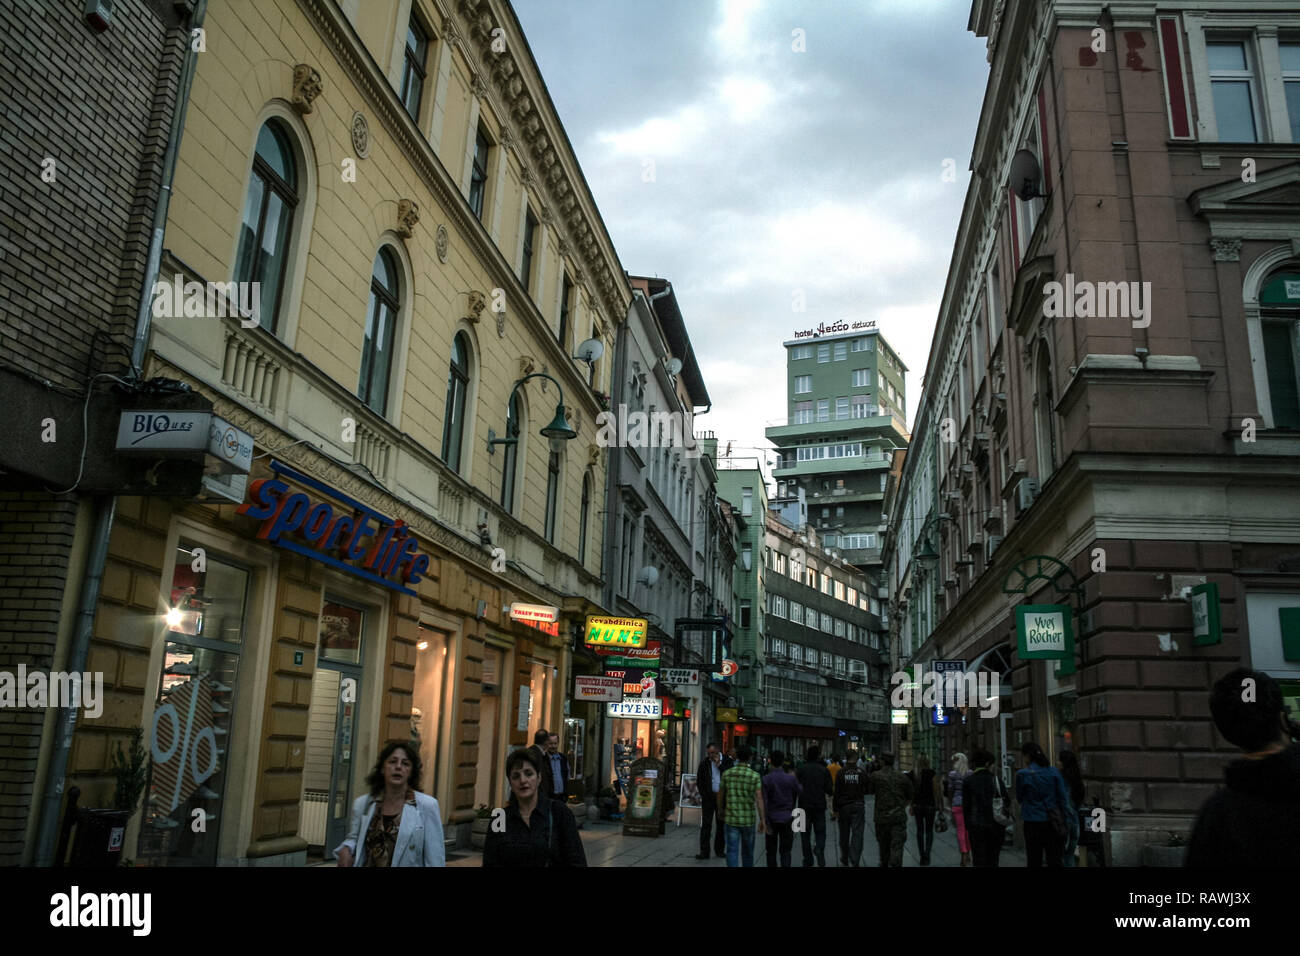 Ulica Street Scene Stock Photos & Ulica Street Scene Stock